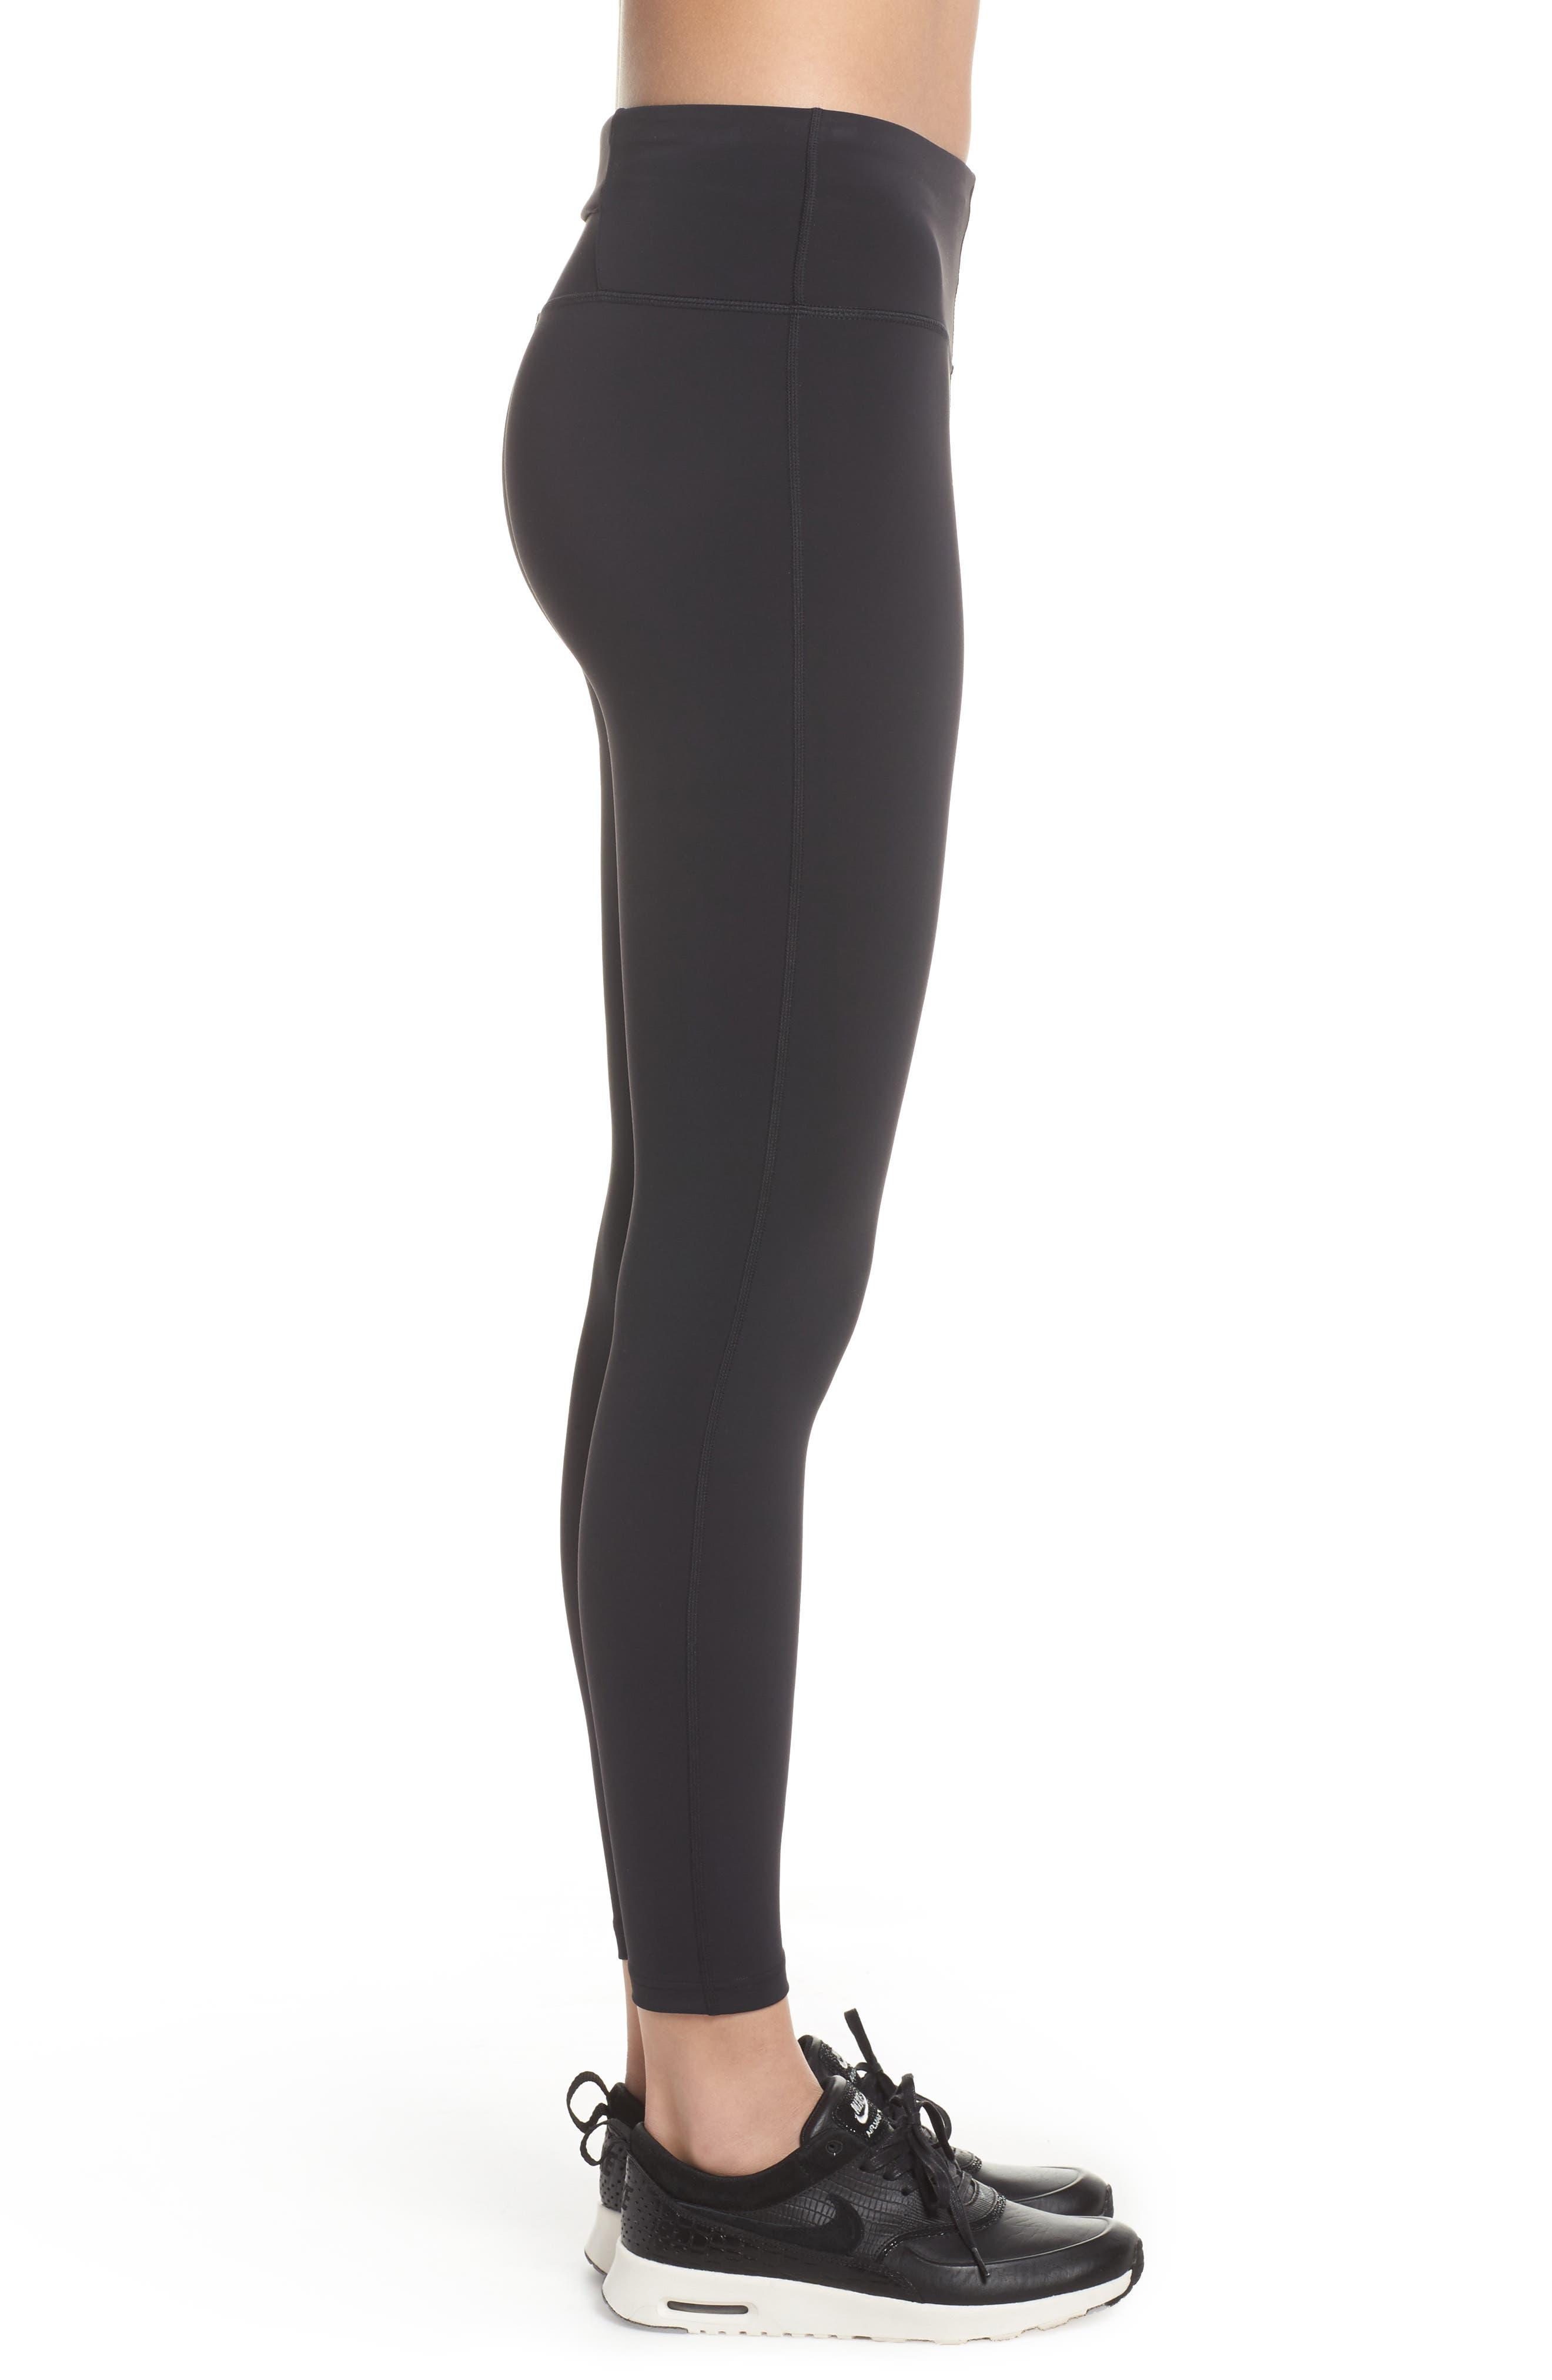 NikeLab Women's Tights,                             Alternate thumbnail 3, color,                             BLACK/ BLACK